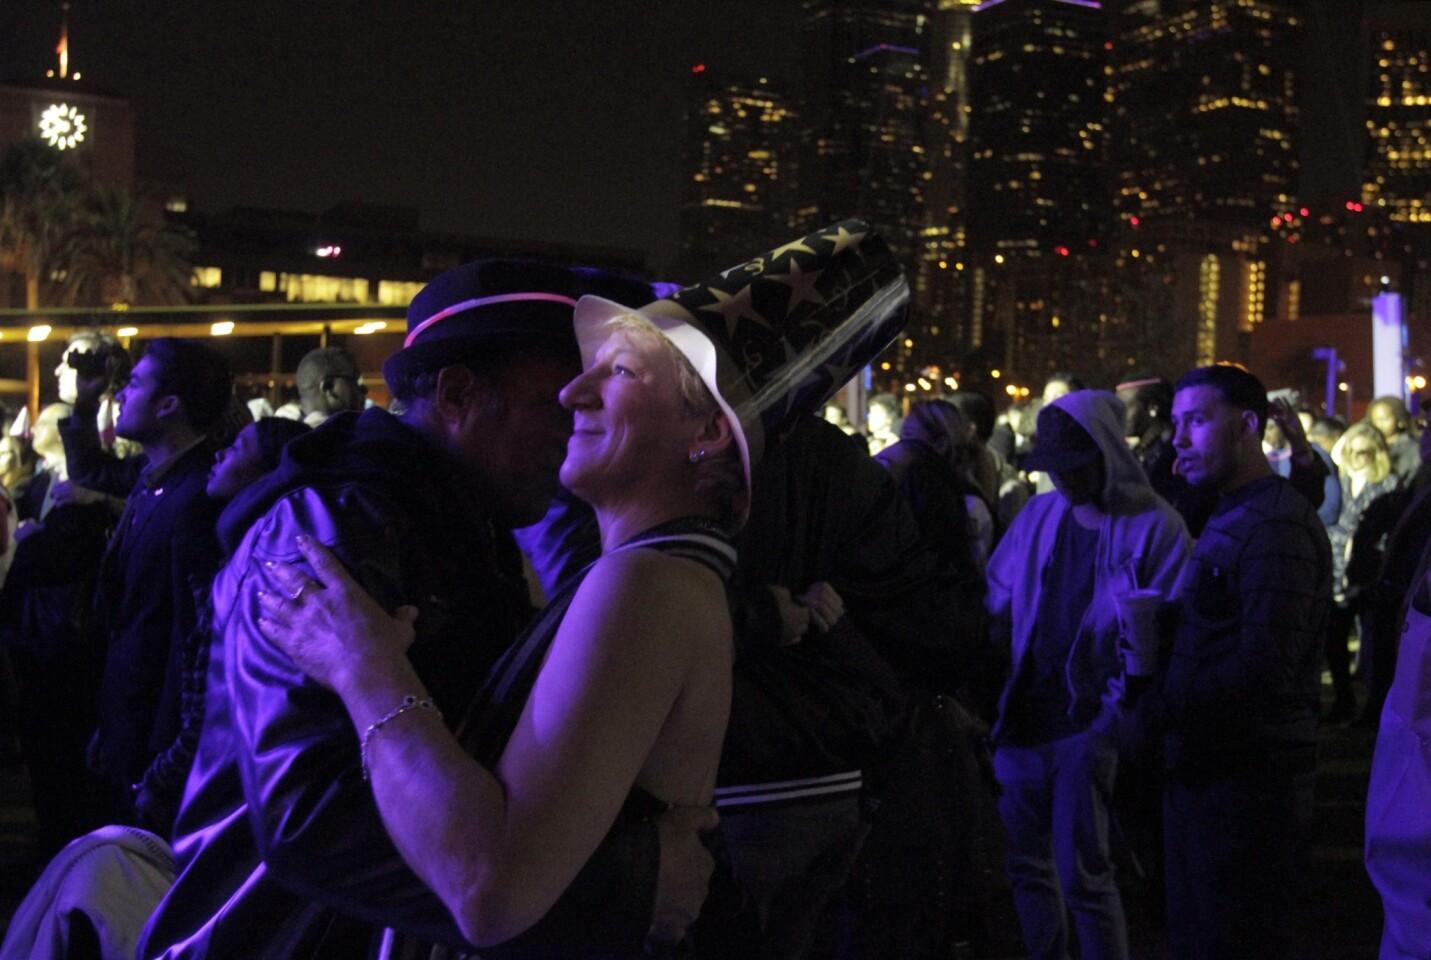 Cheryl Willard and partner Alex Gantz dance at Grand Park on New Year's Eve.